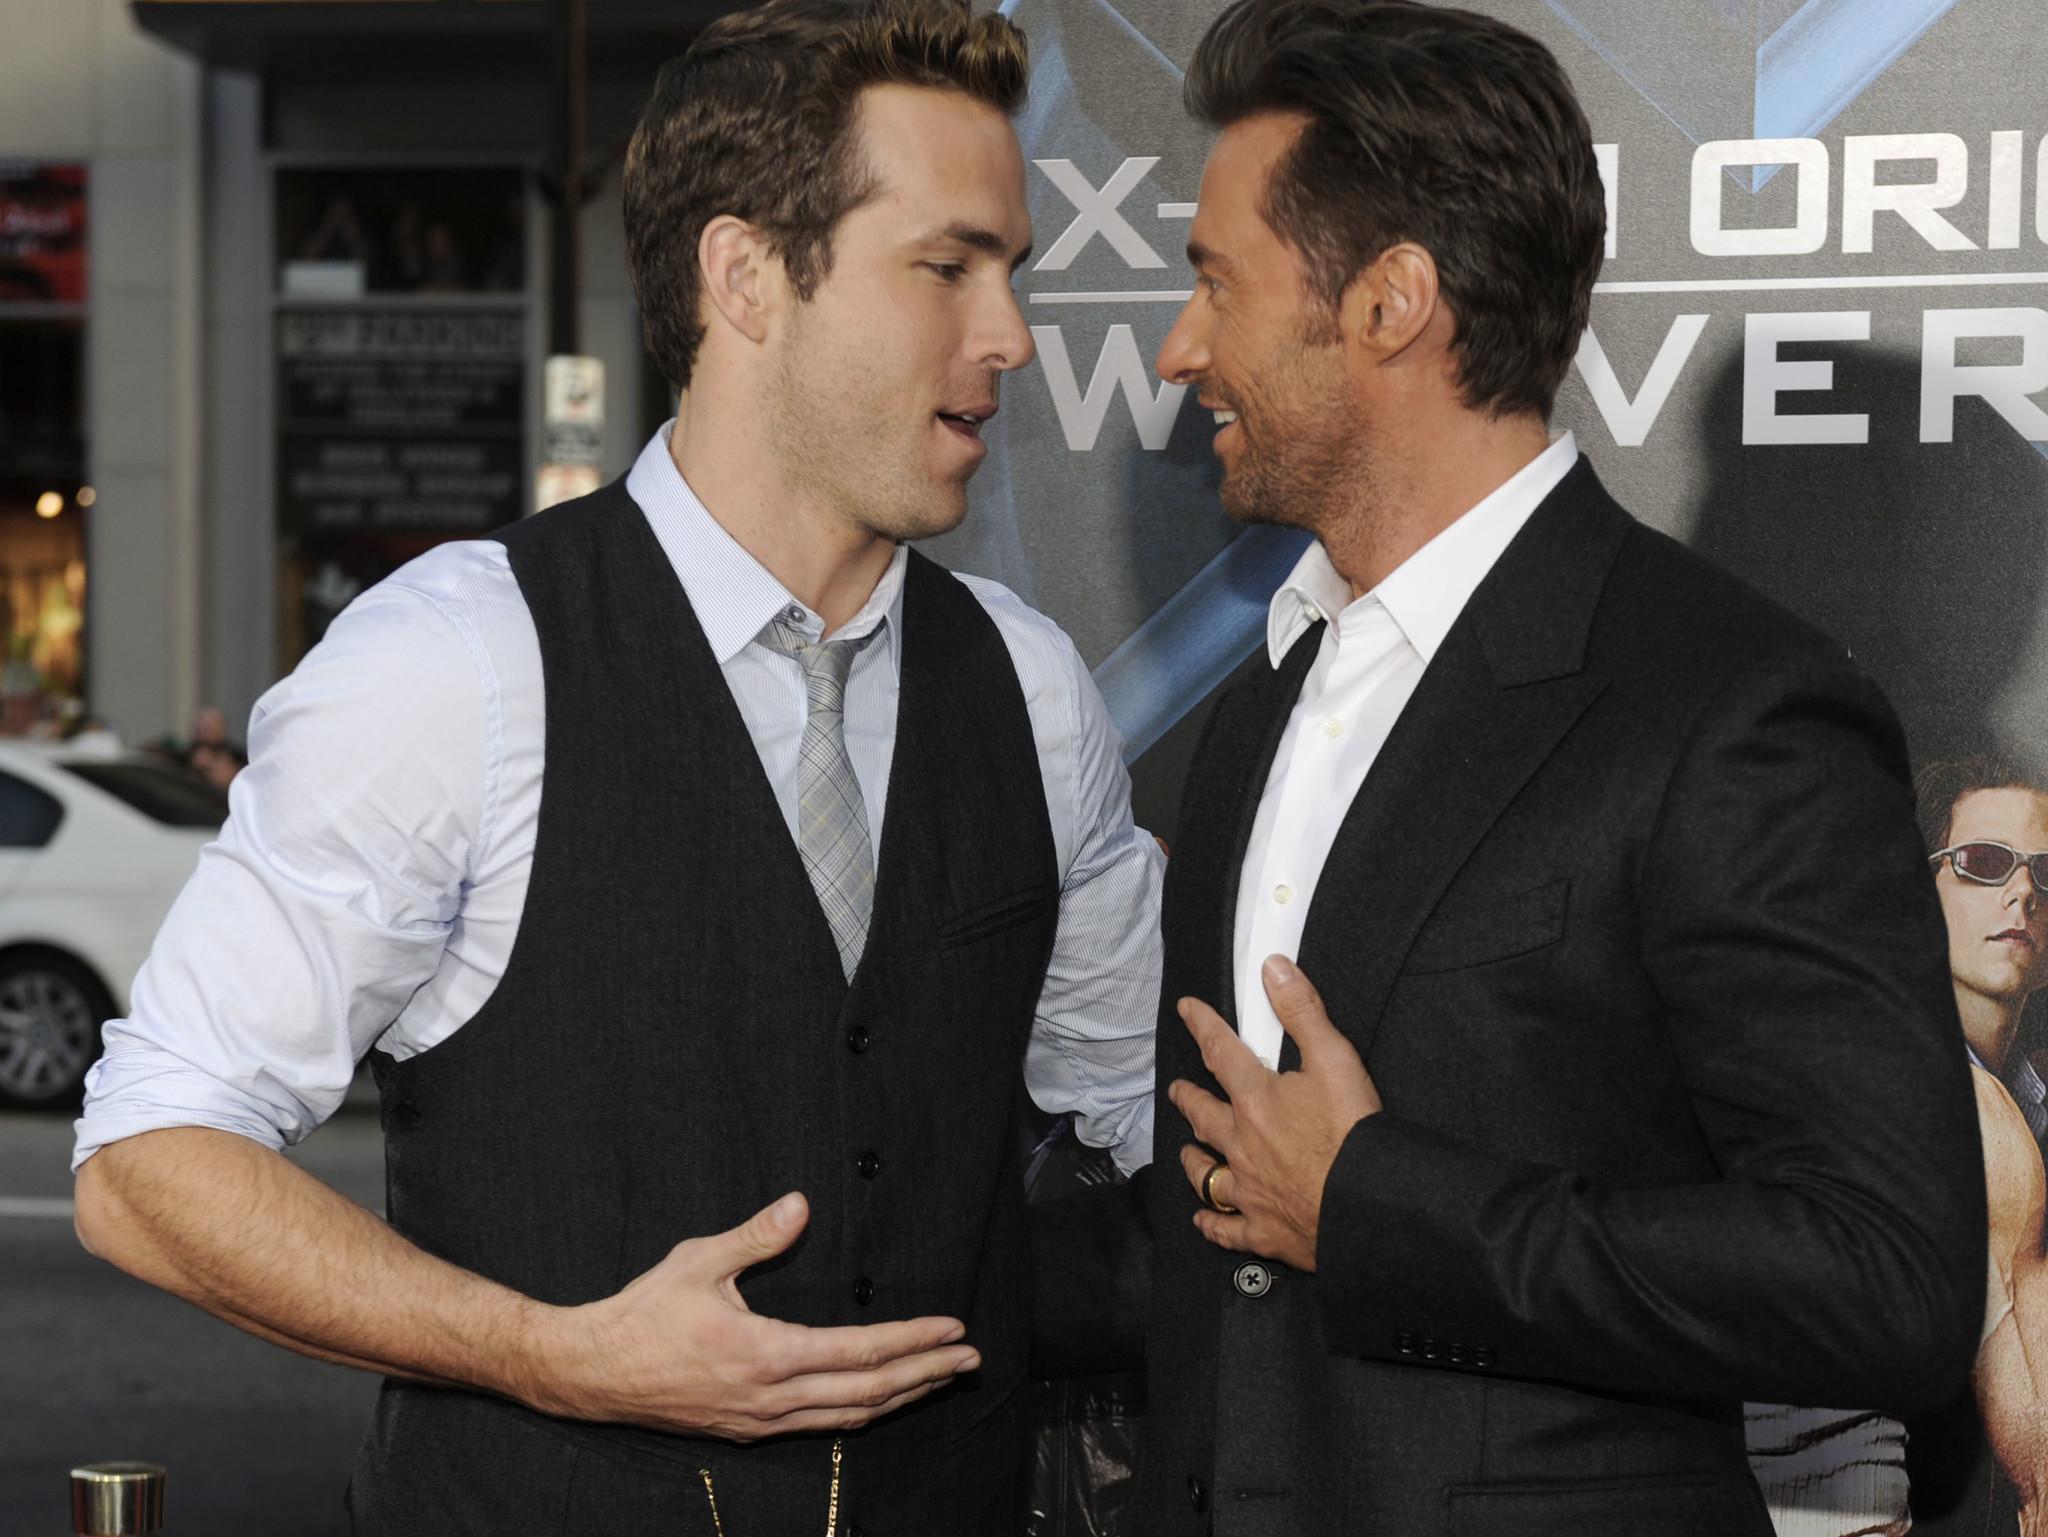 Ryan Reynolds and Hugh Jackman put their 'feud' aside for coronavirus relief efforts